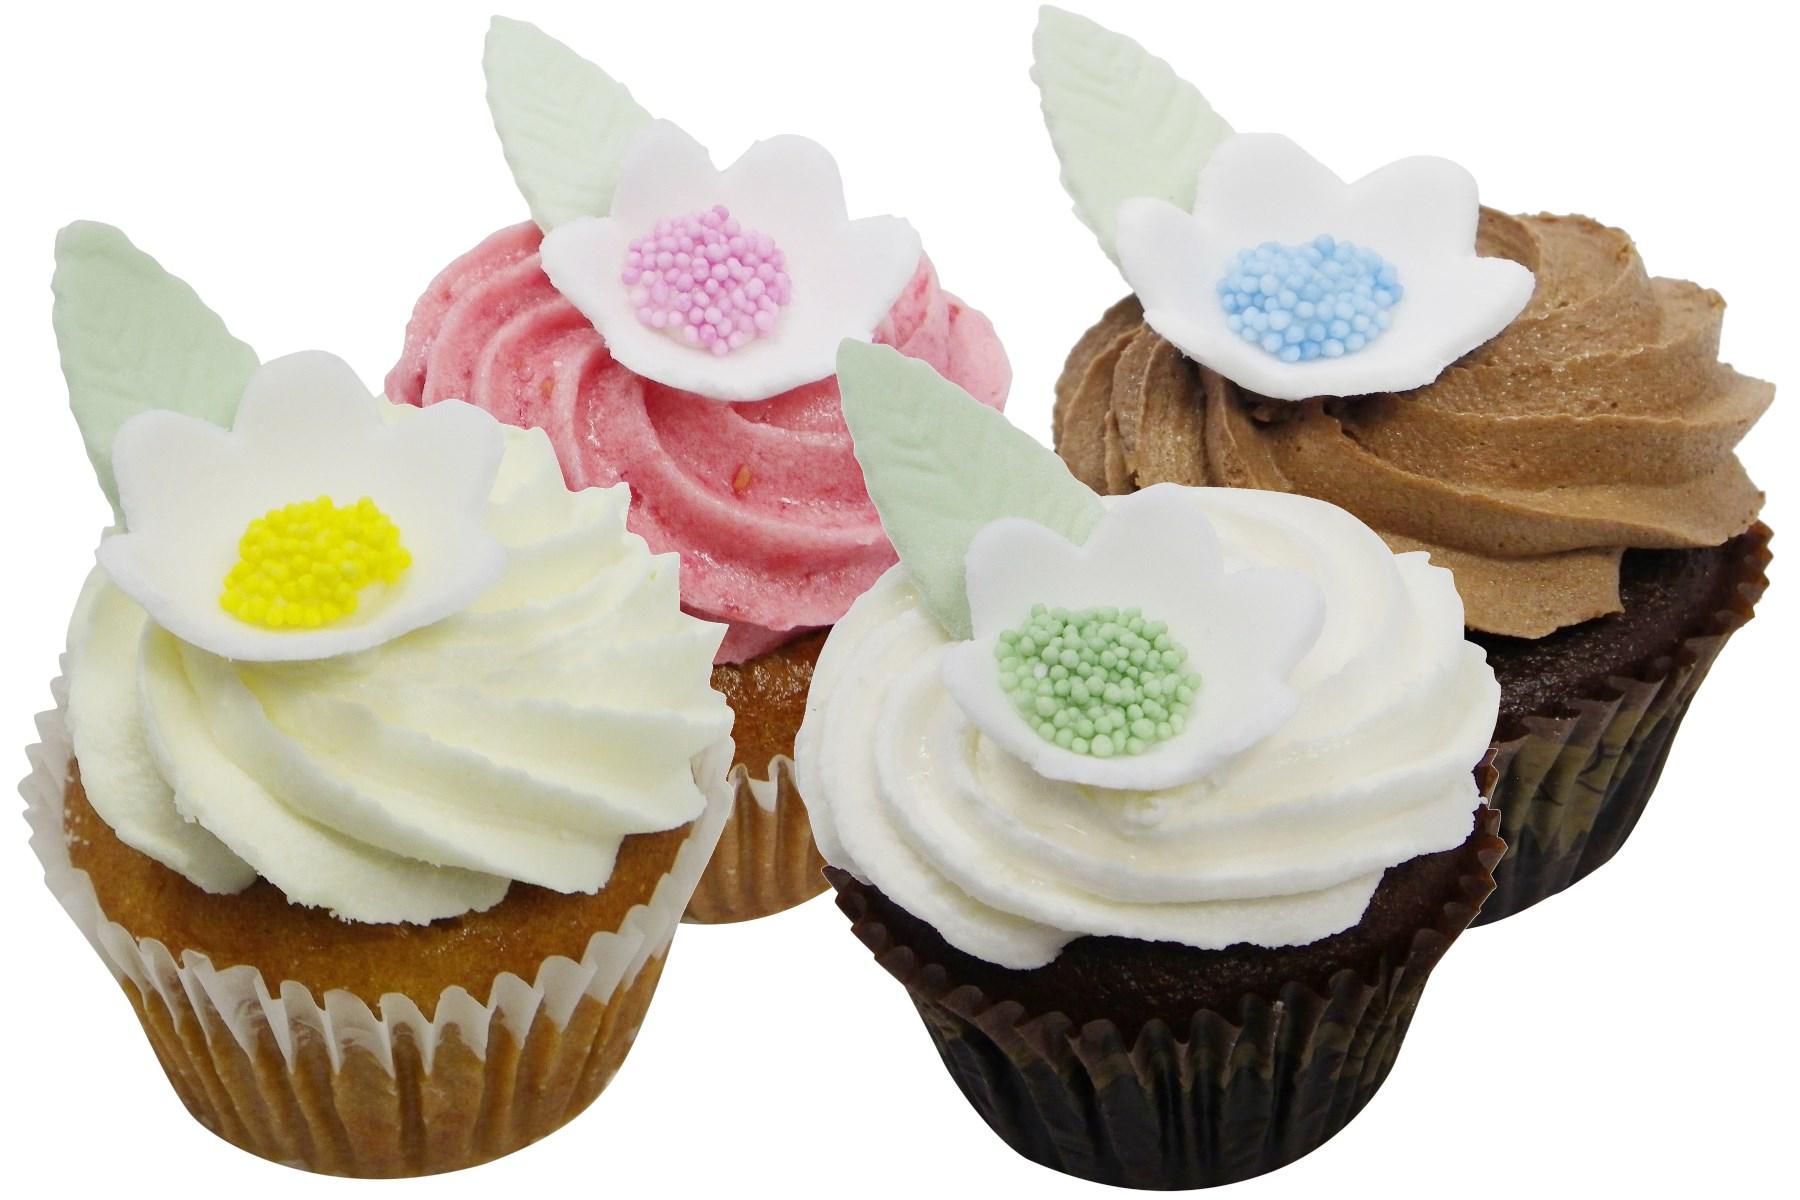 Vegan Gluten Friendly Cupcakes